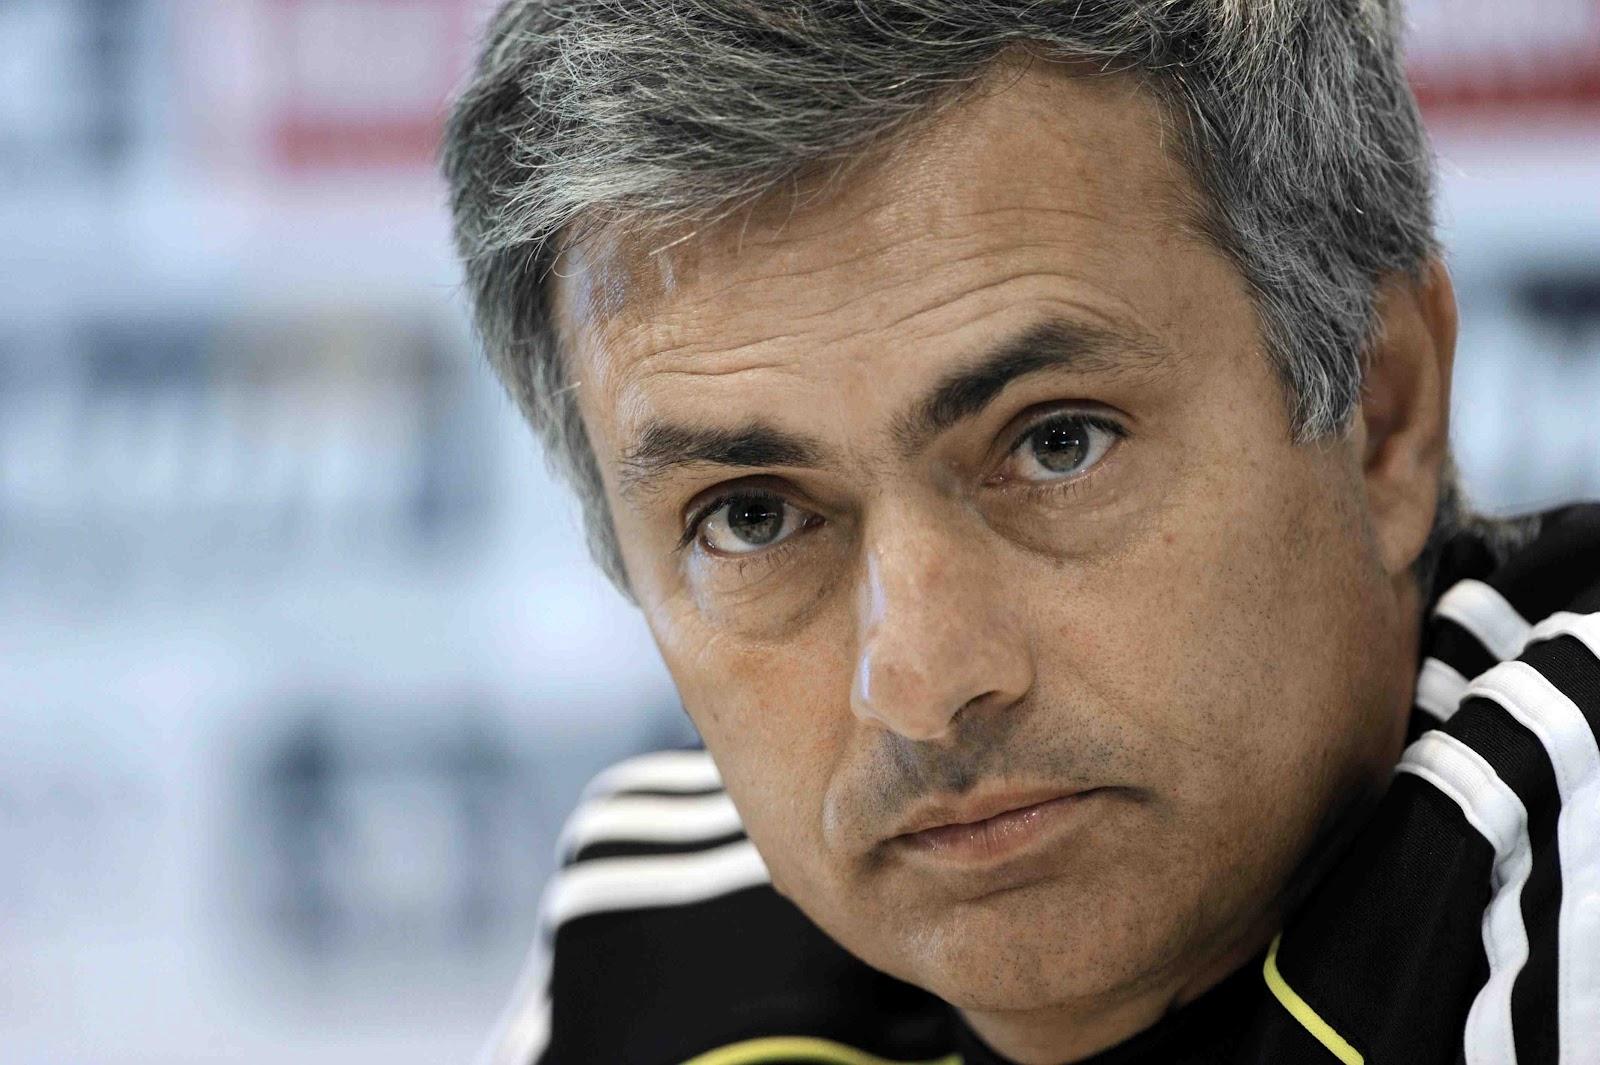 Mourinho Ralat Ucapannya Tentang Keajaiban buat Masuk Top 4 EPL